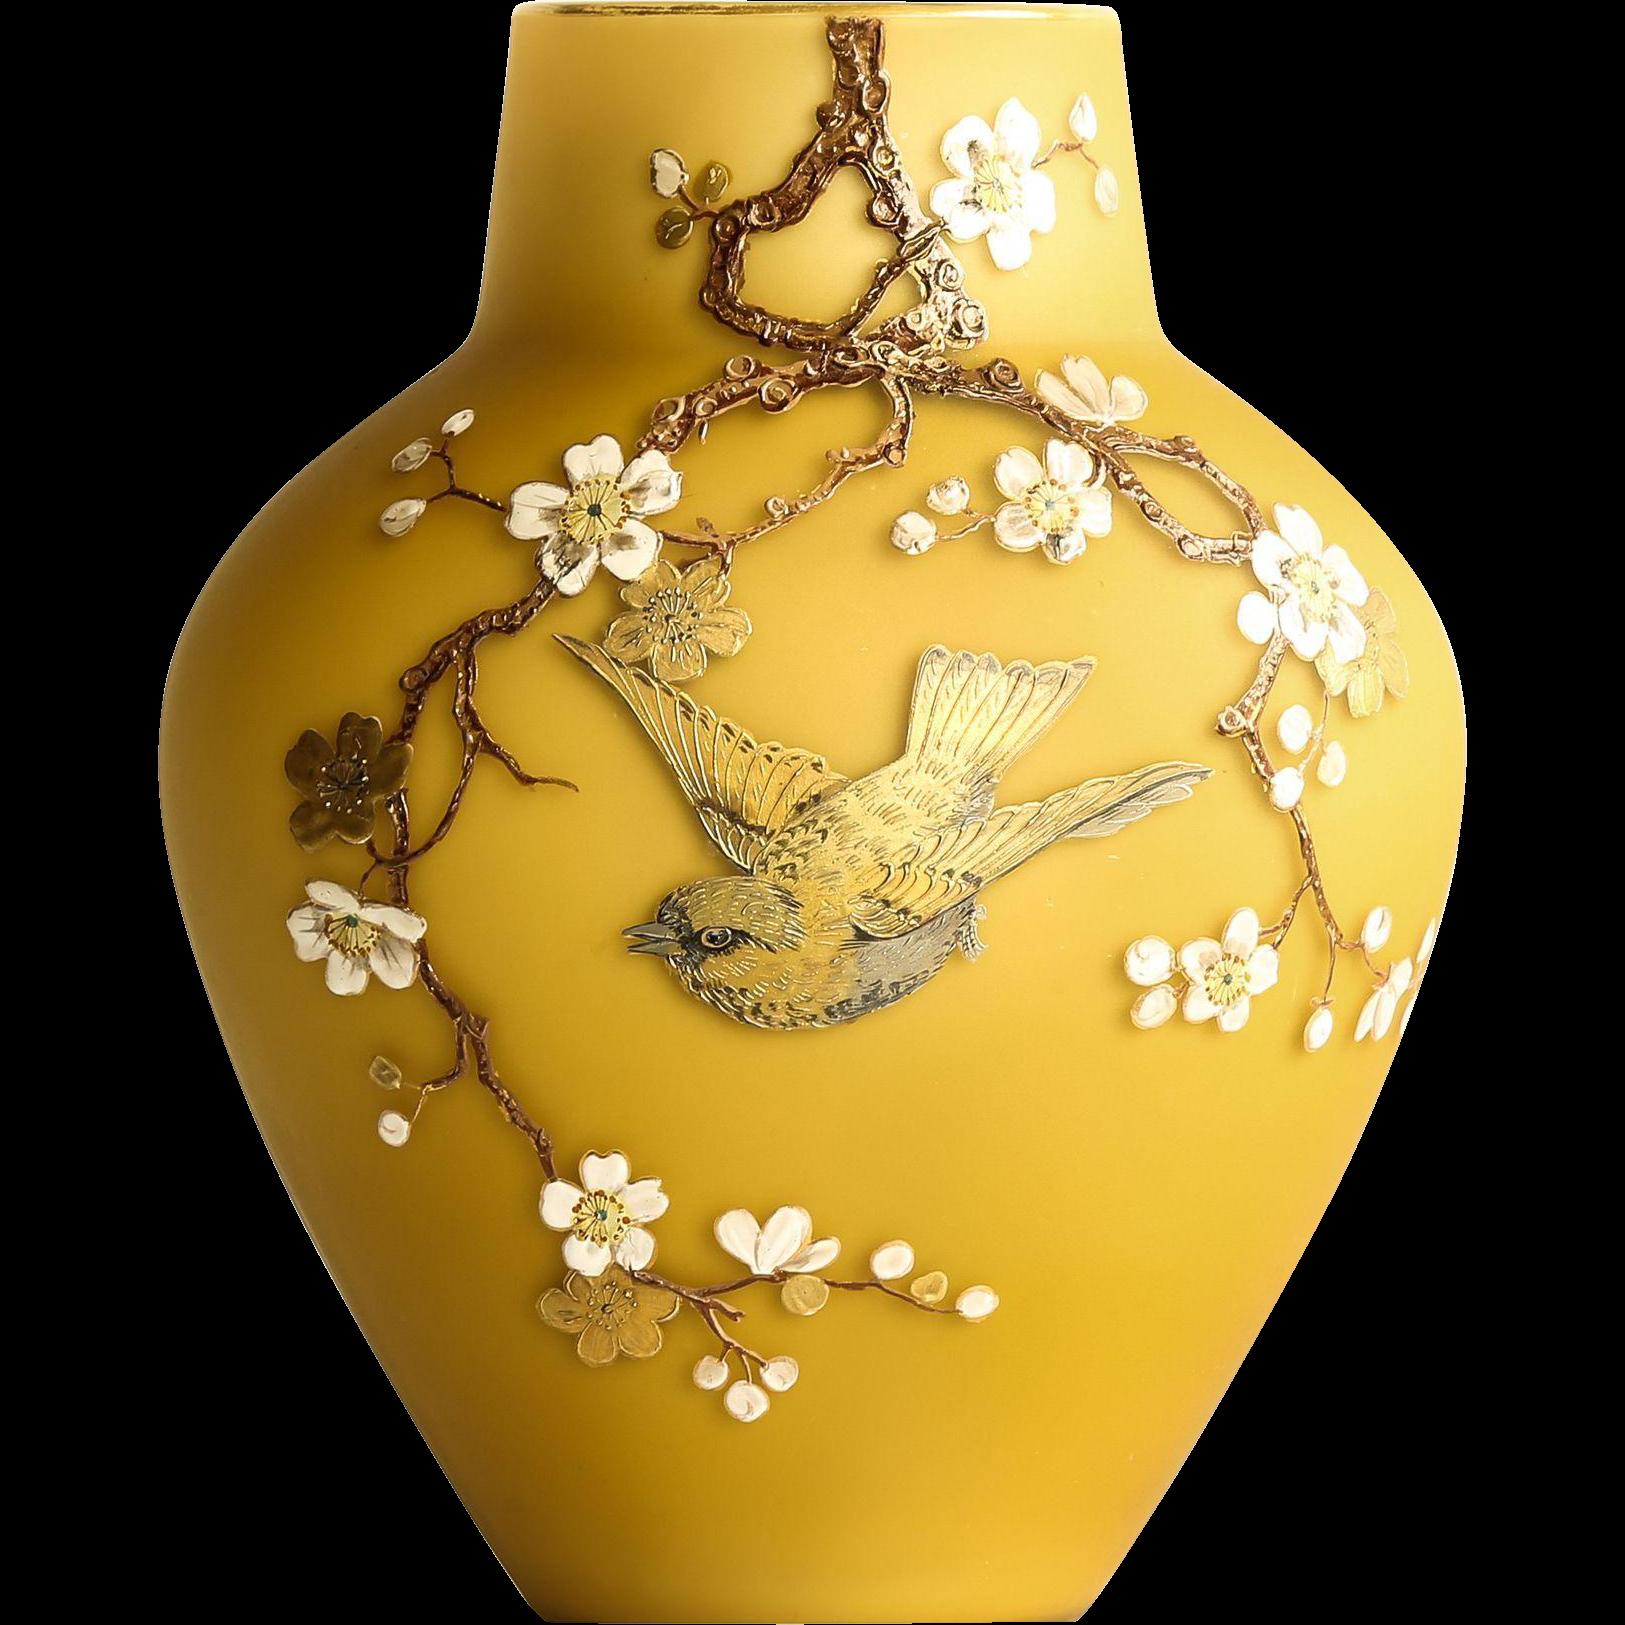 Beautiful Circa 1880 Harrach Victorian Satin Glass Vase With Enameled Bird & Floral Motif